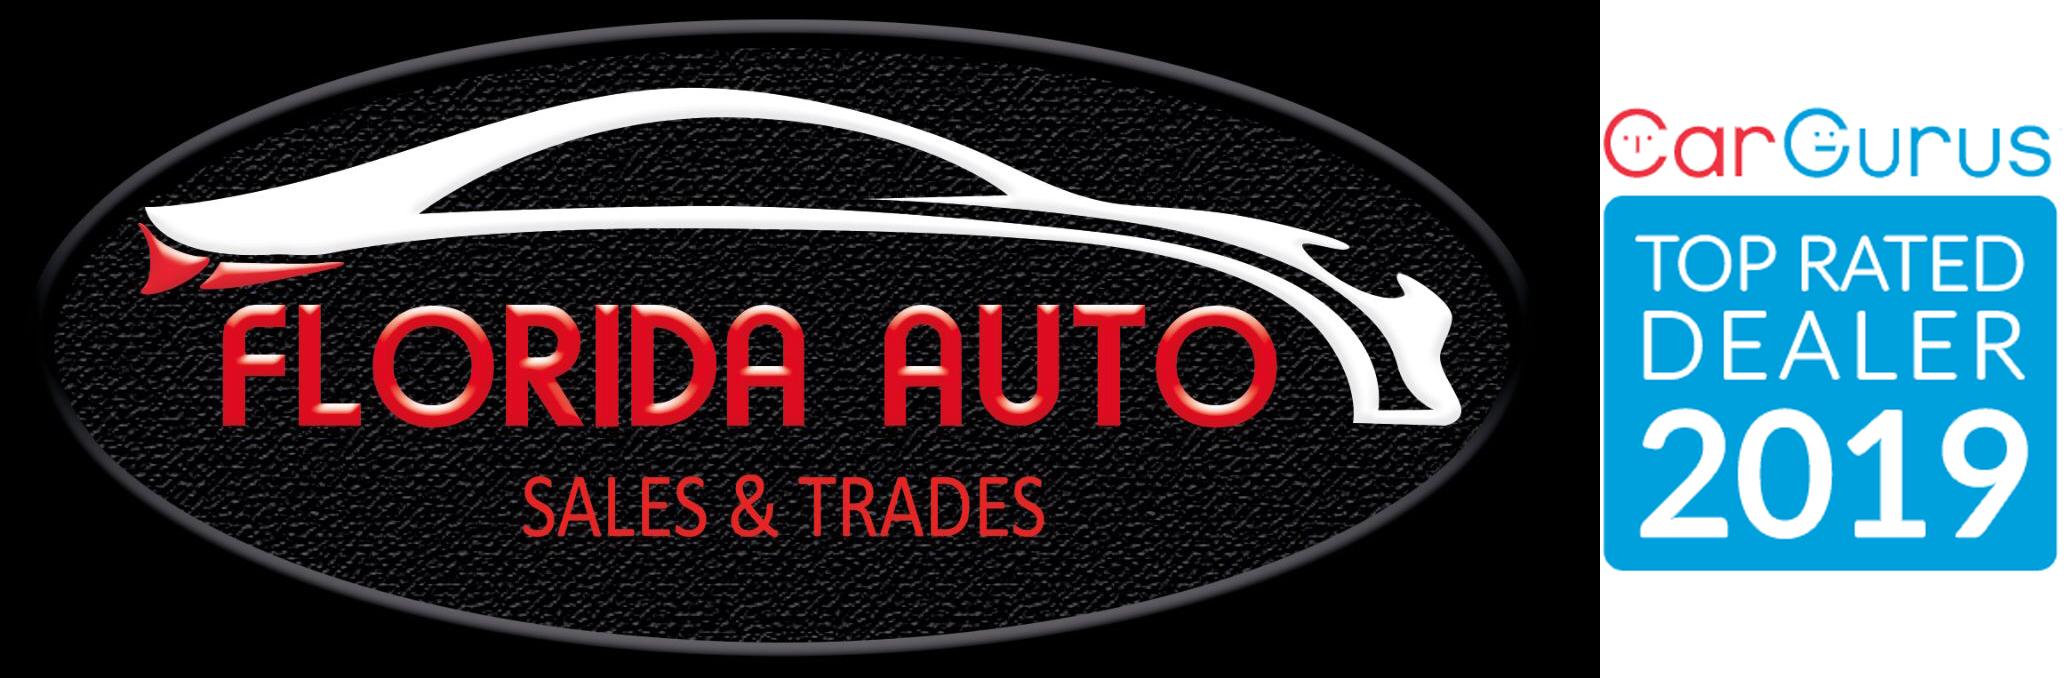 Florida Auto Sales & Trades Logo